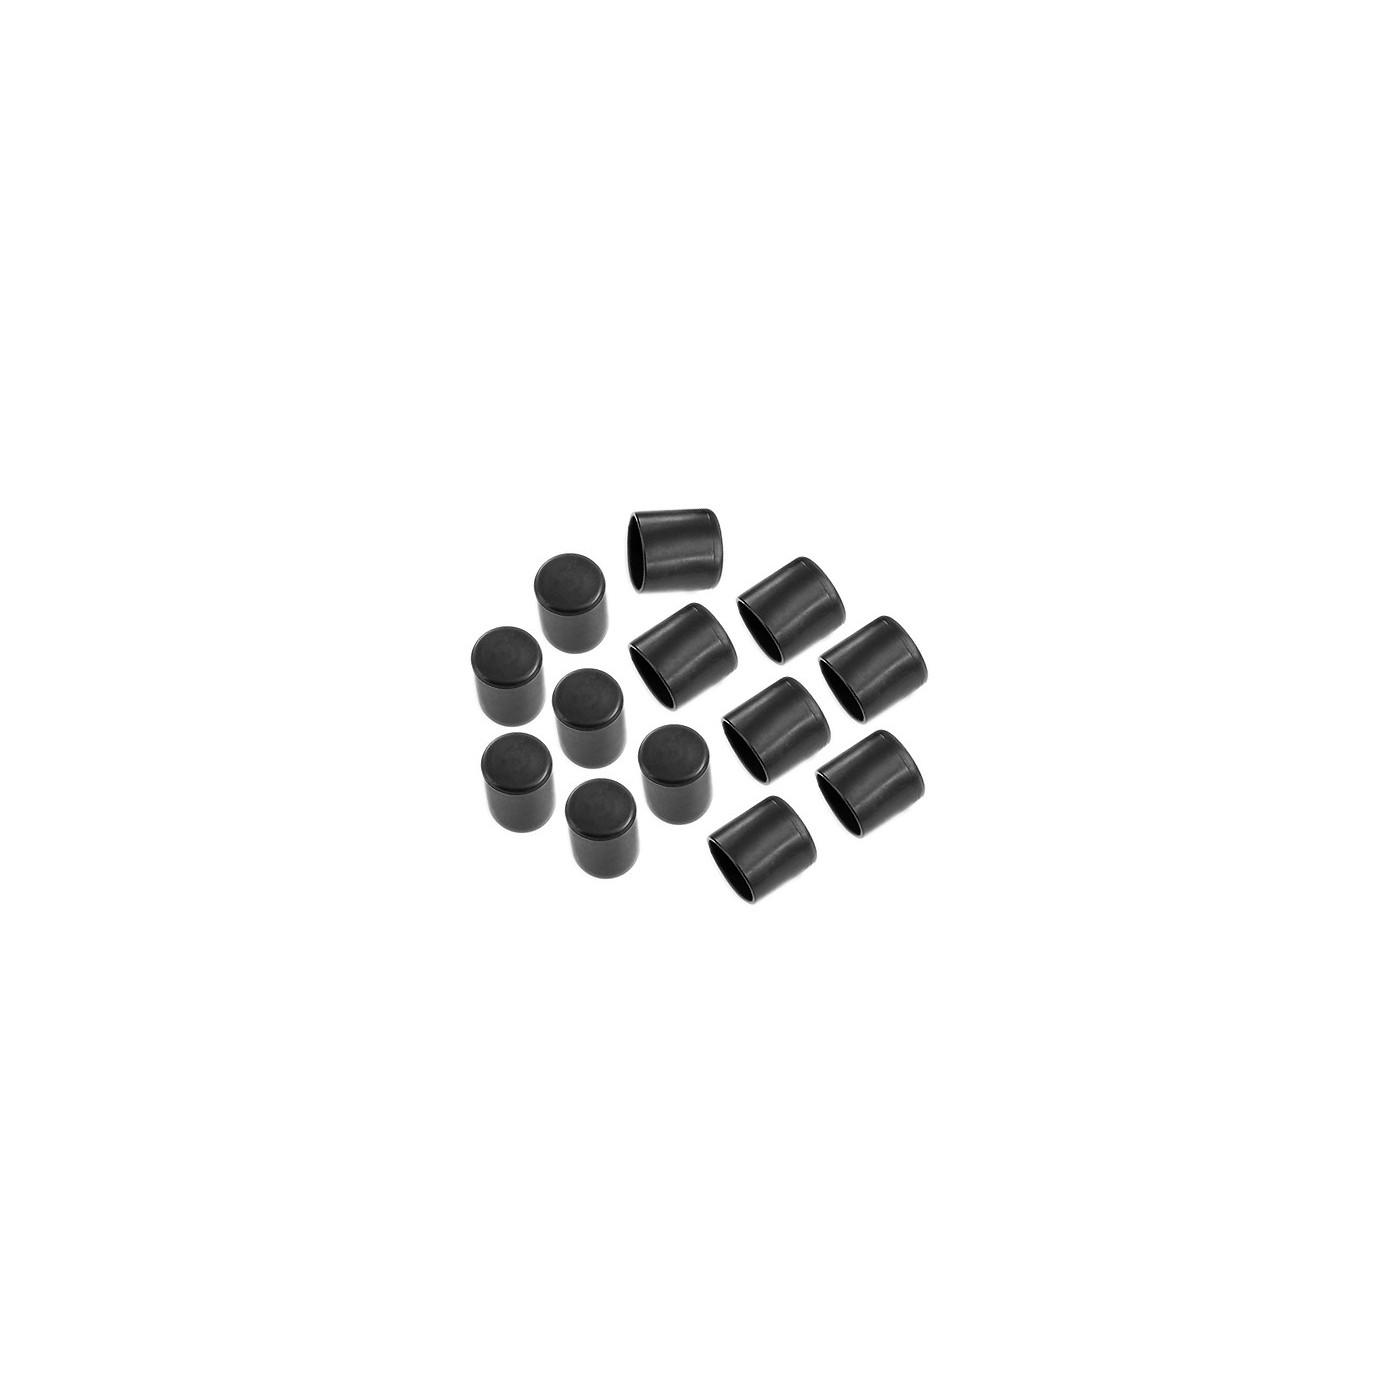 Set of 32 silicone chair leg caps (outside, round, 25 mm, black) [O-RO-25-B]  - 1